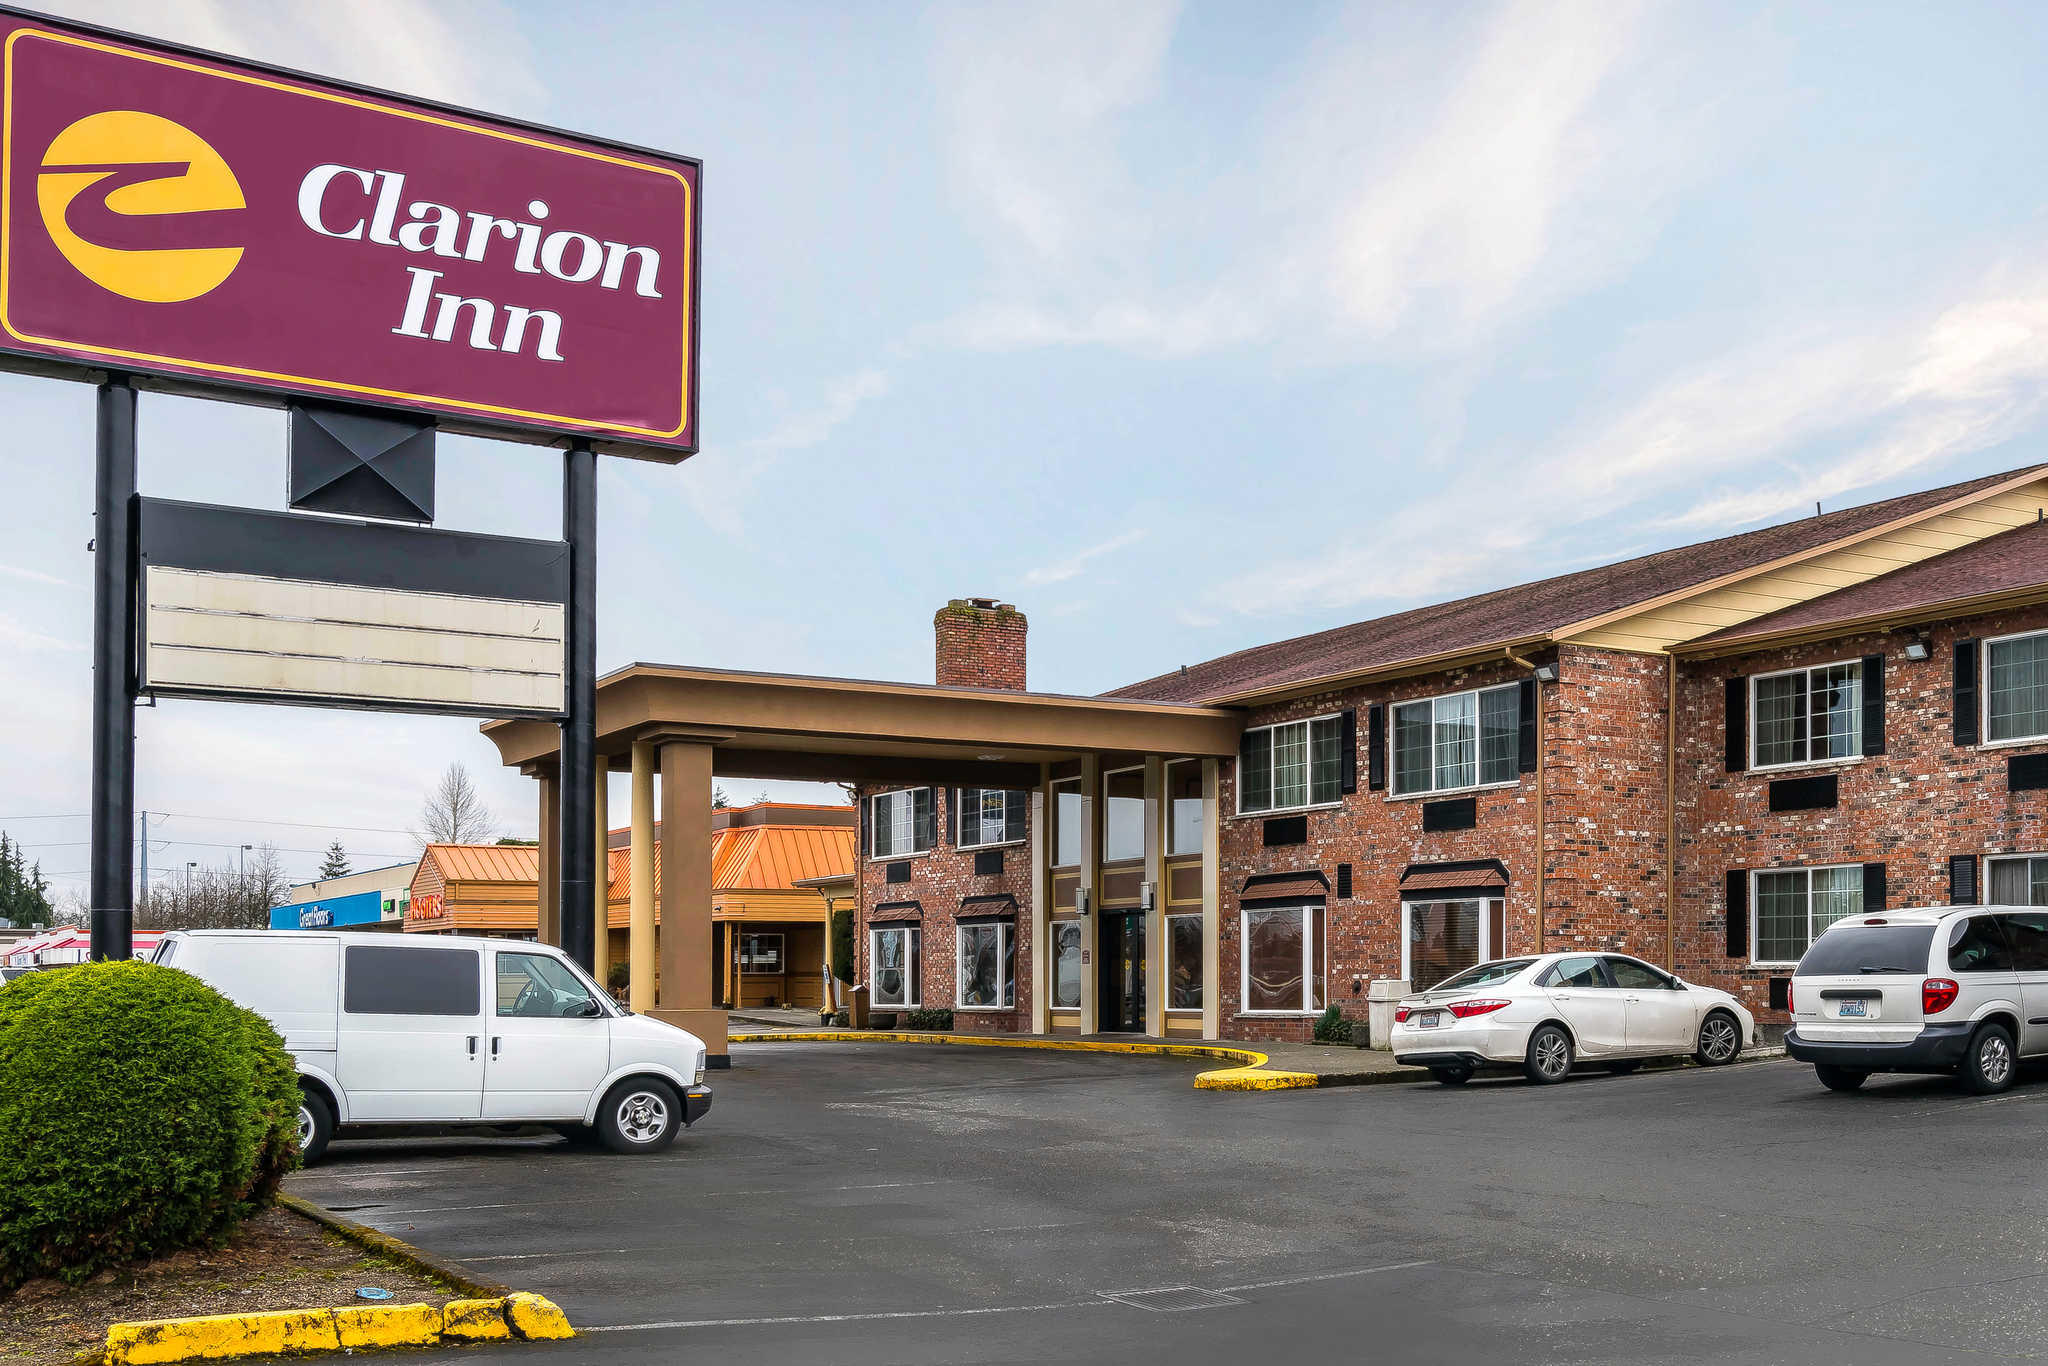 Clarion Inn near JBLM - Tacoma, WA - Business Page